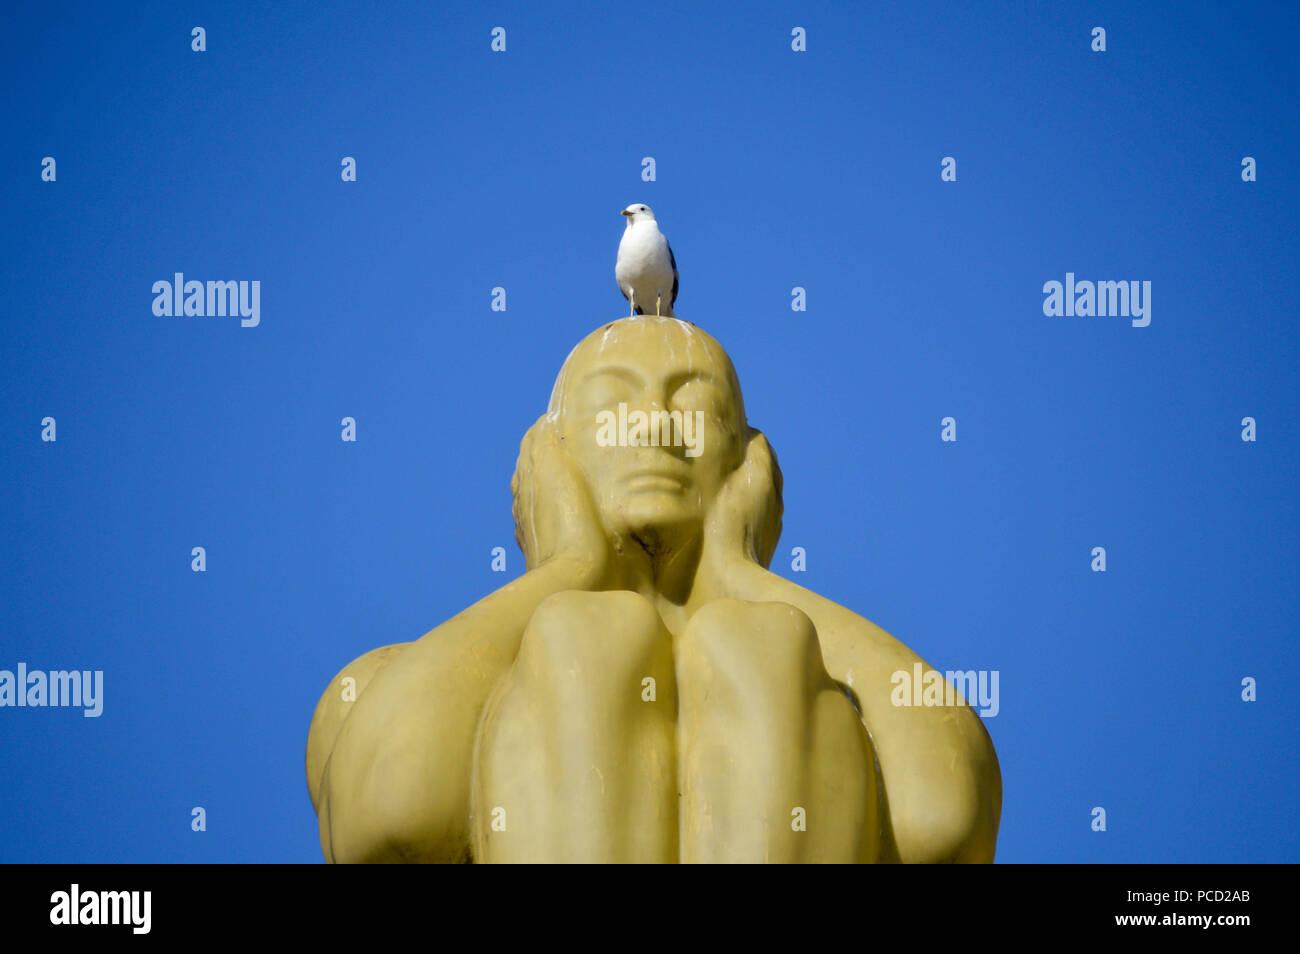 Seagull resting ona a deaf man monument in Gothenburg, Sweden. - Stock Image